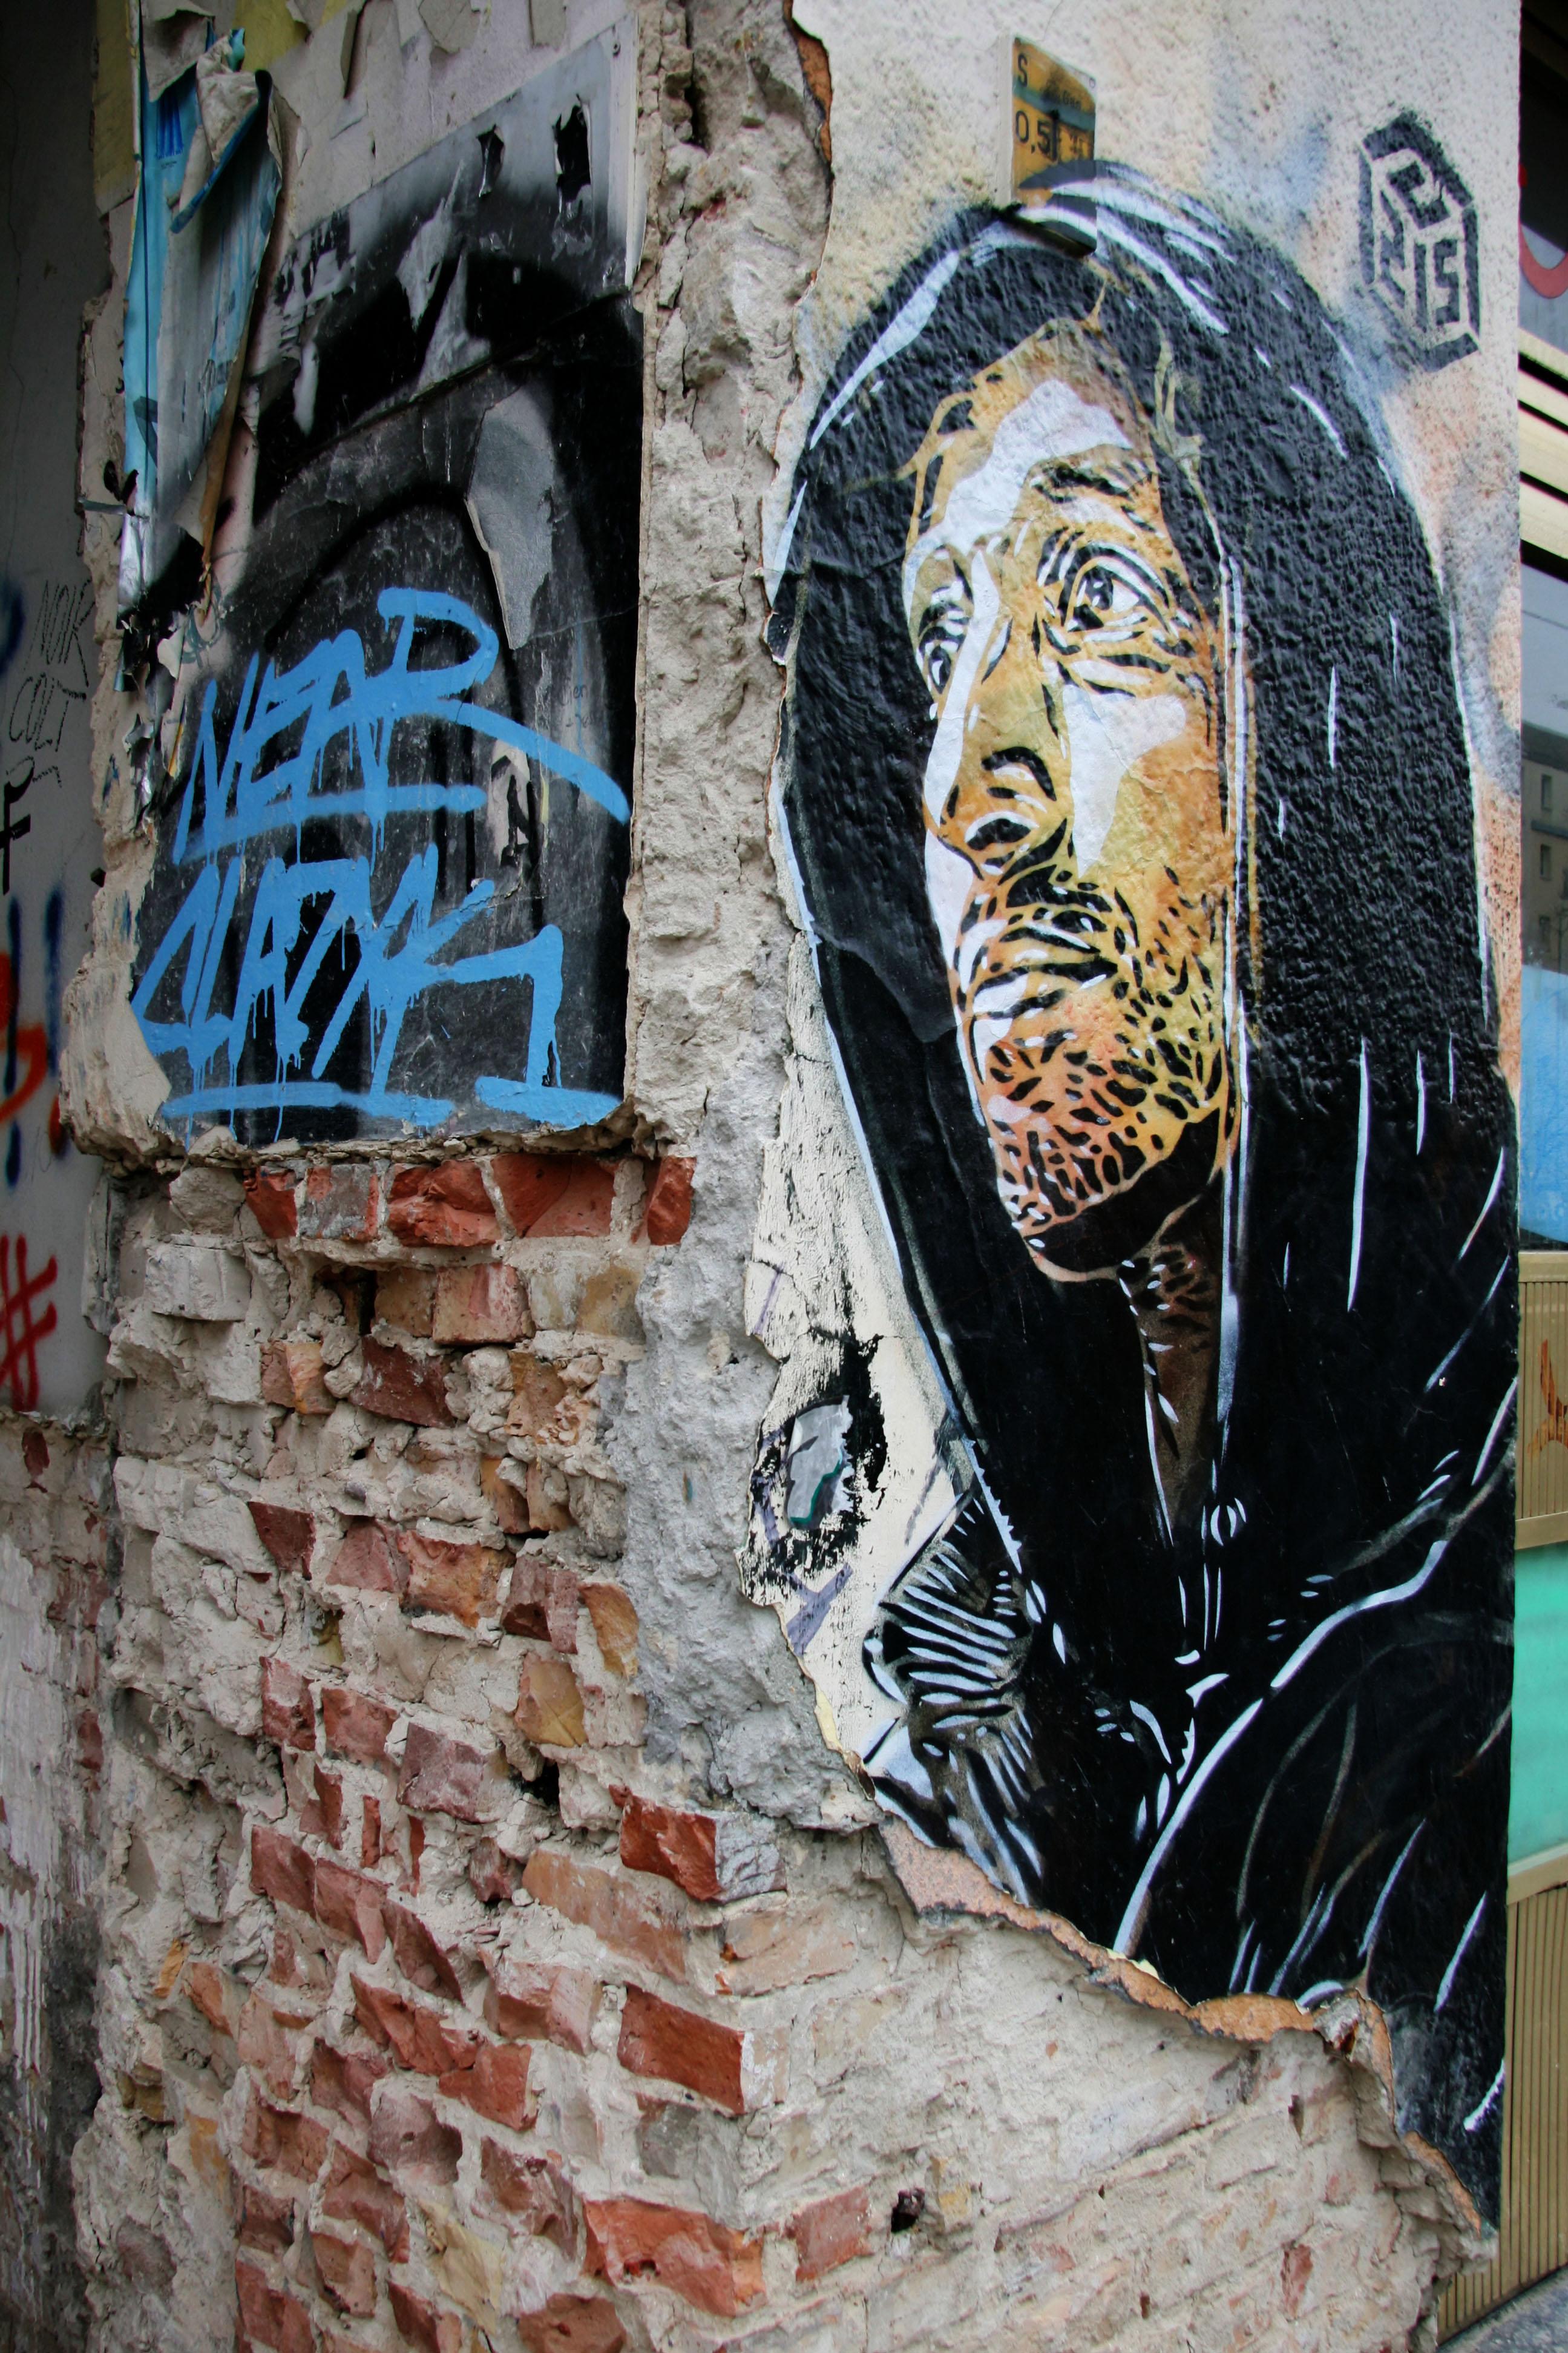 Man In A Hoodie: Street Art by C215 (Christian Guémy) in Berlin